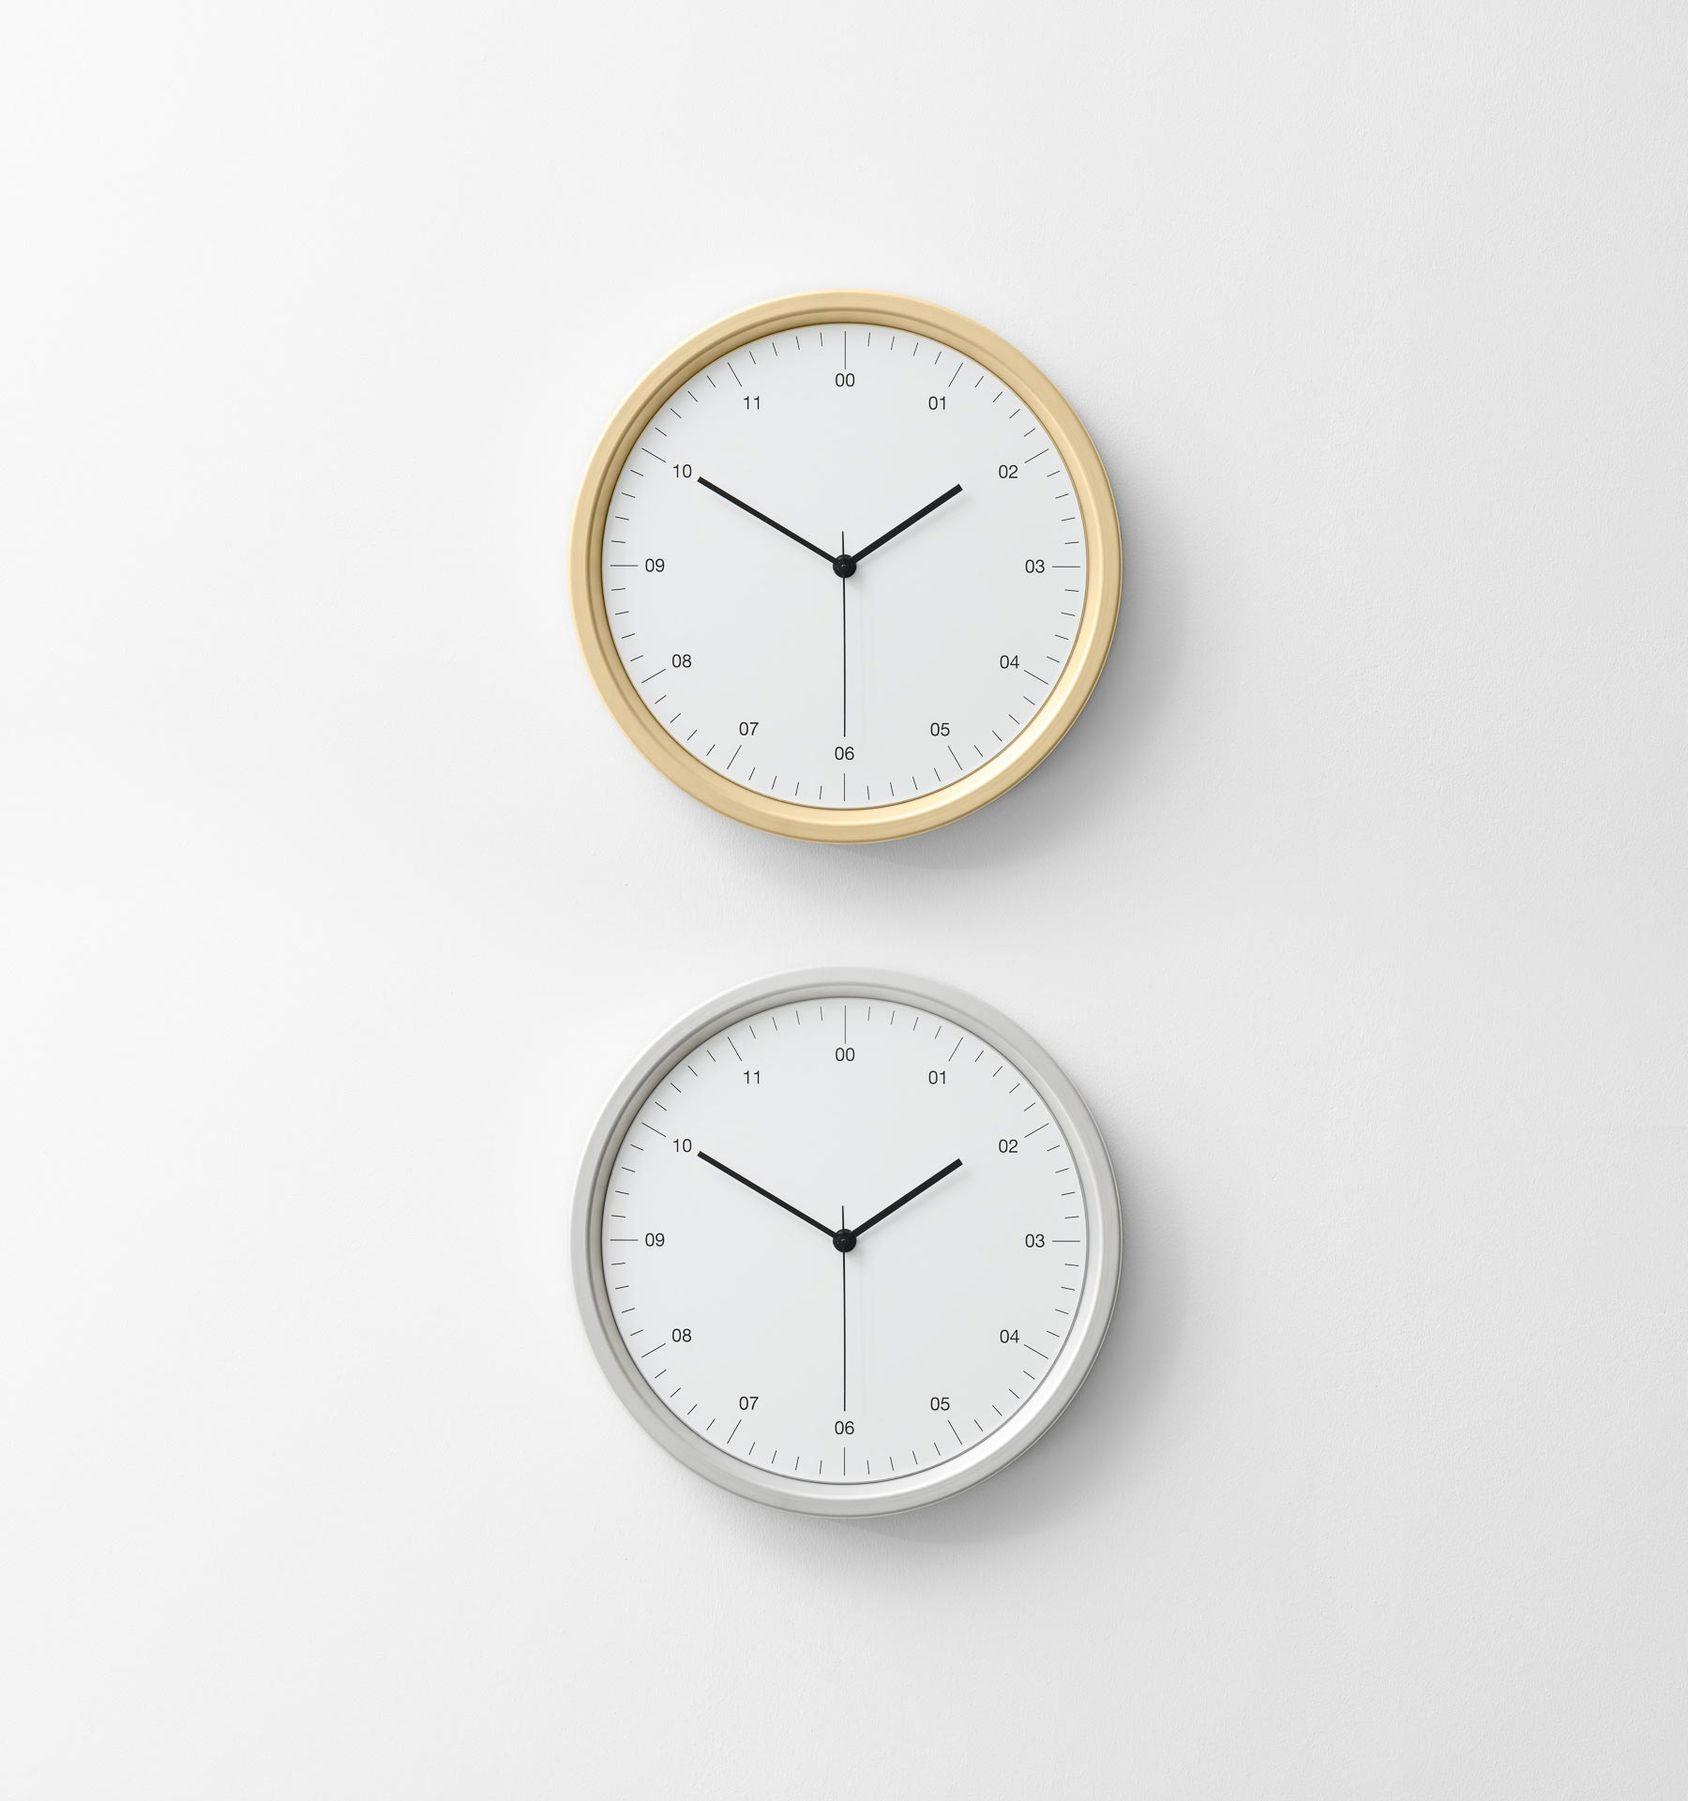 Stilrena klockor med liten twist